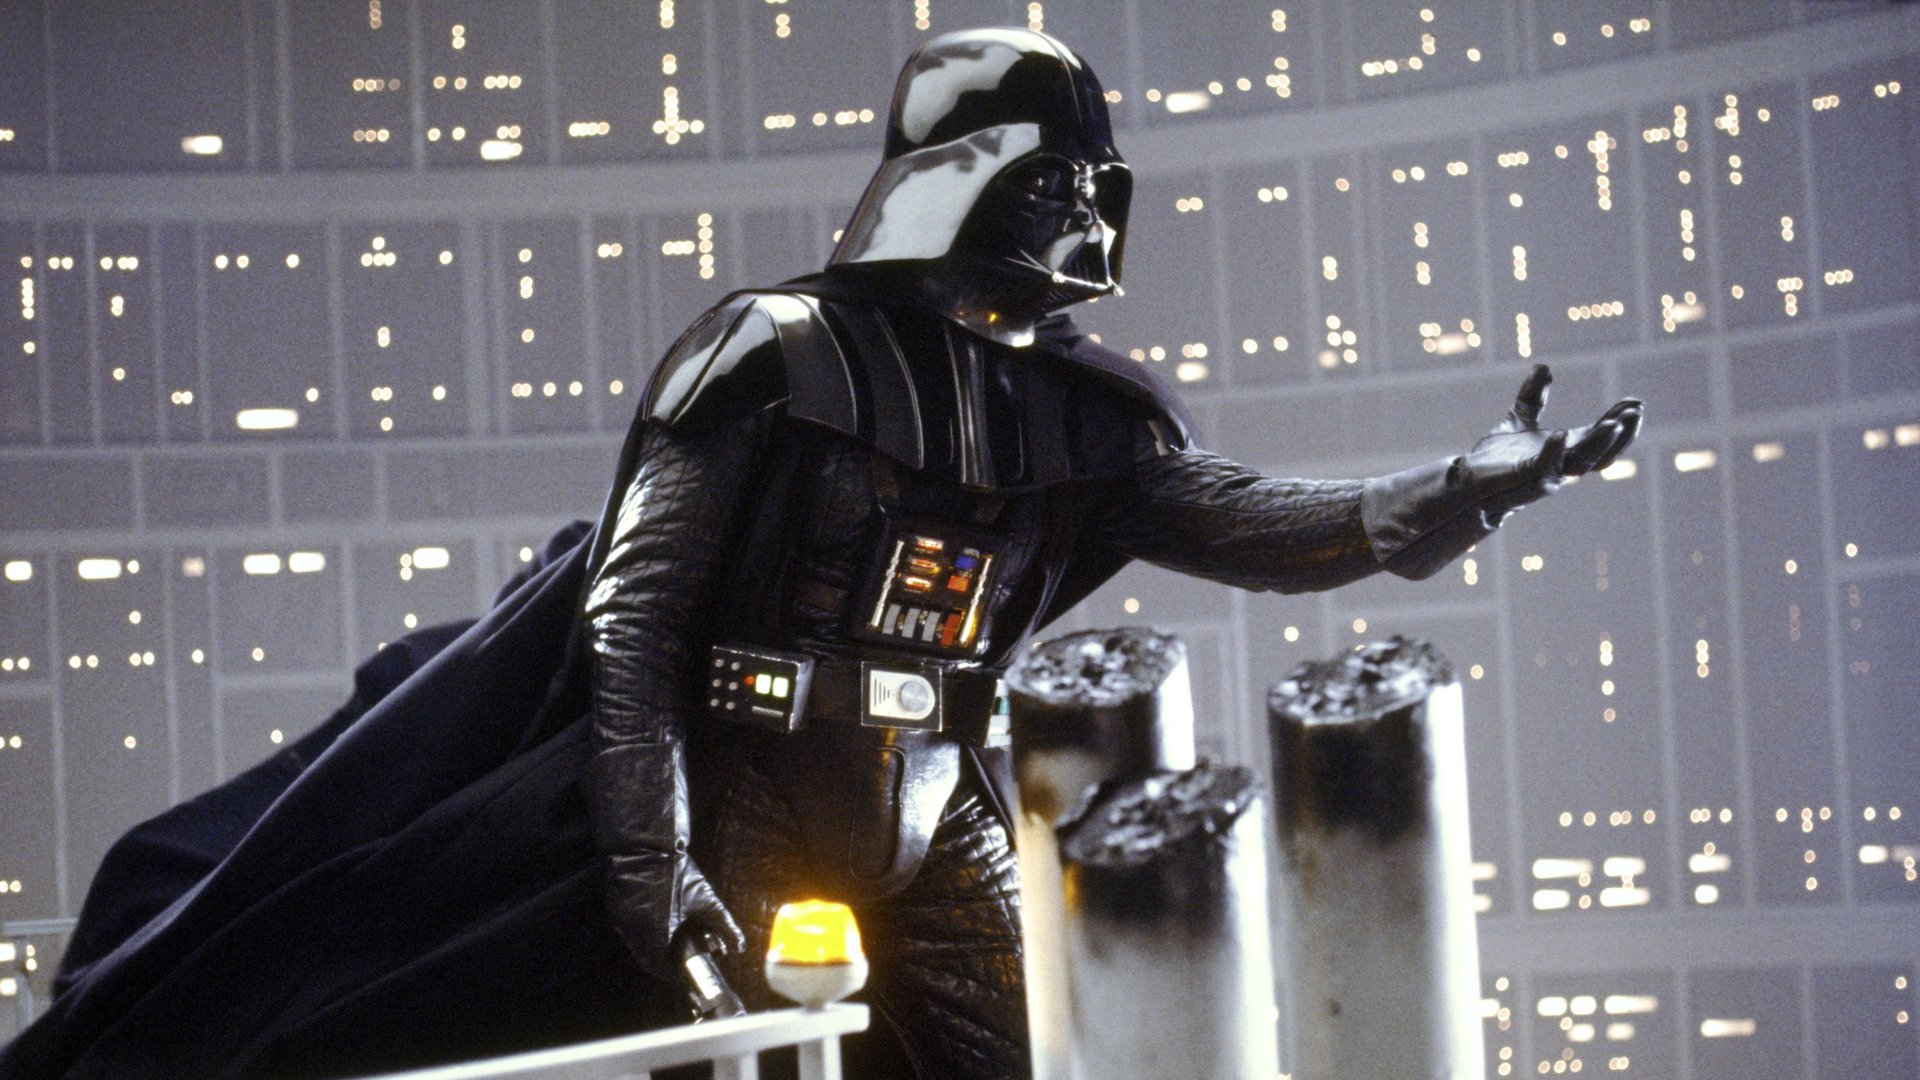 Movie - Star Wars Episode V: The Empire Strikes Back  Darth Vader Episode 5 Wallpaper